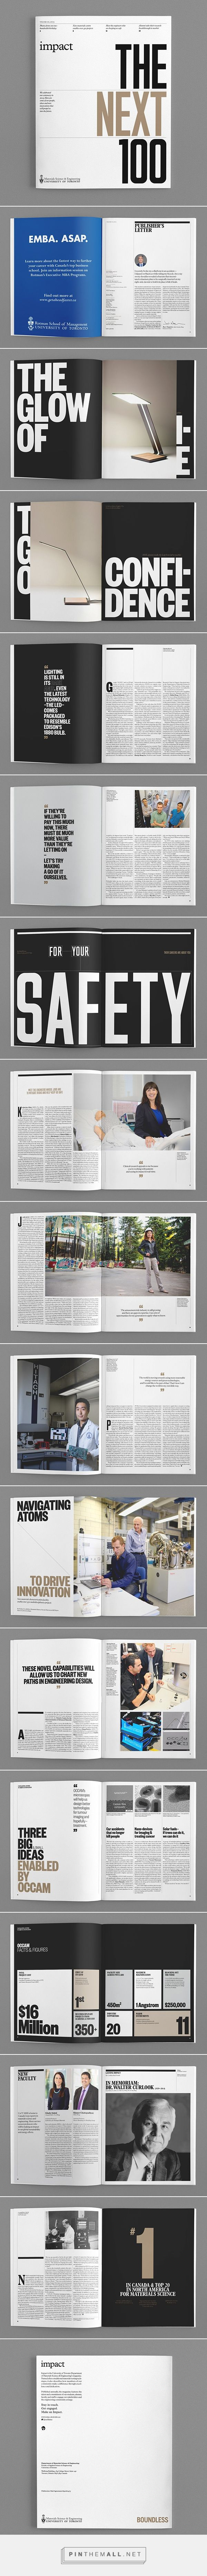 Impact Magazine, Issue 3